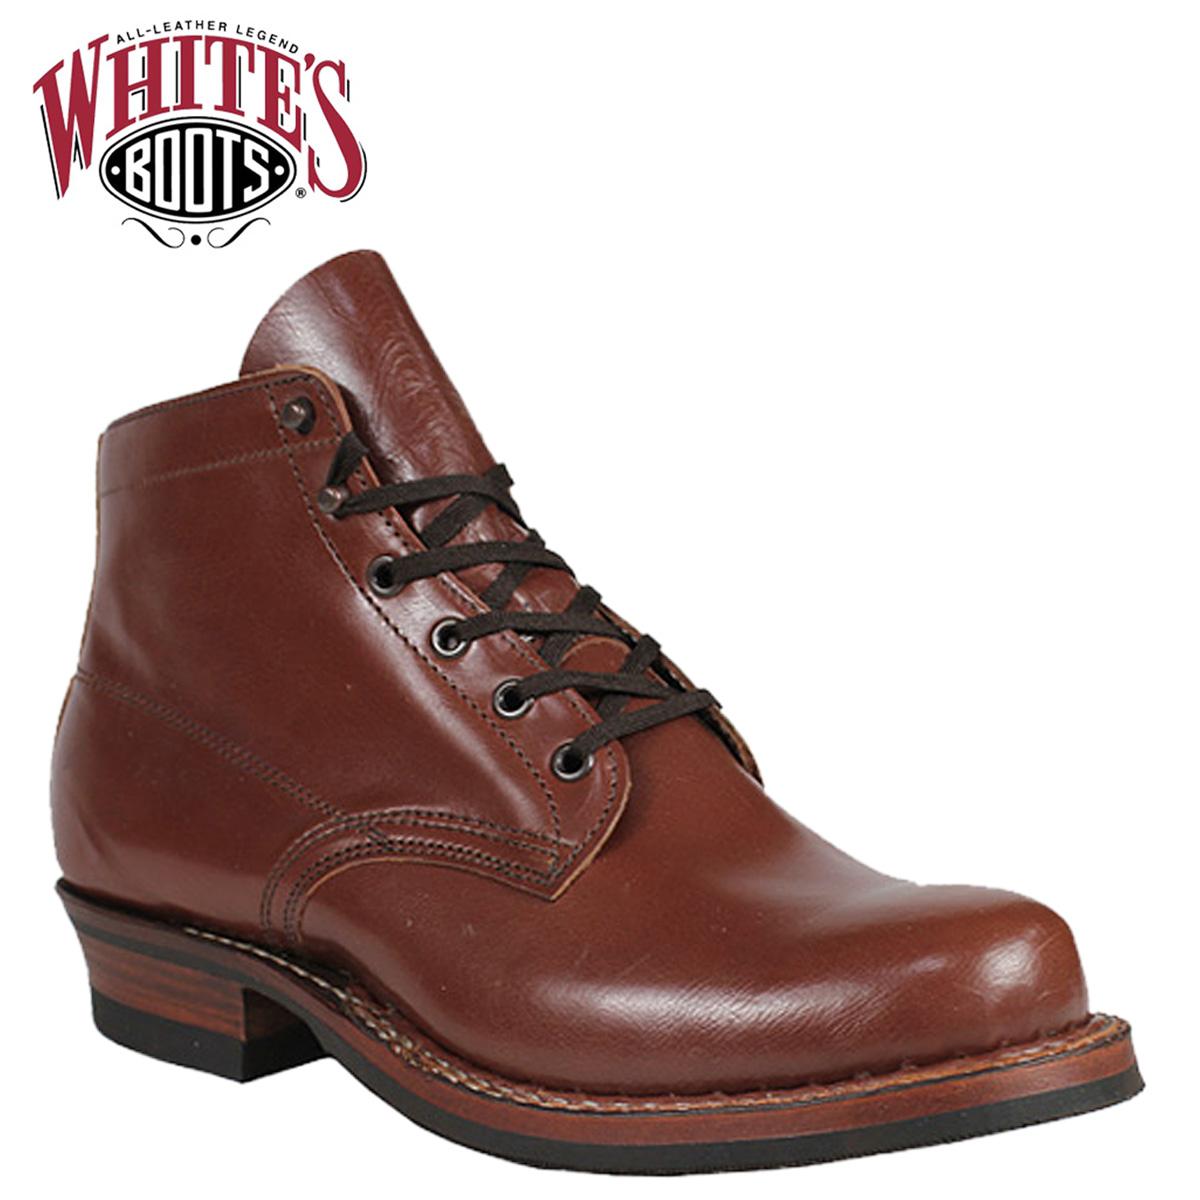 WHITE'S BOOTS ホワイツブーツセミドレス 5INCH AMERICANA SEMIDRESS 2332W Eワイズ メンズ